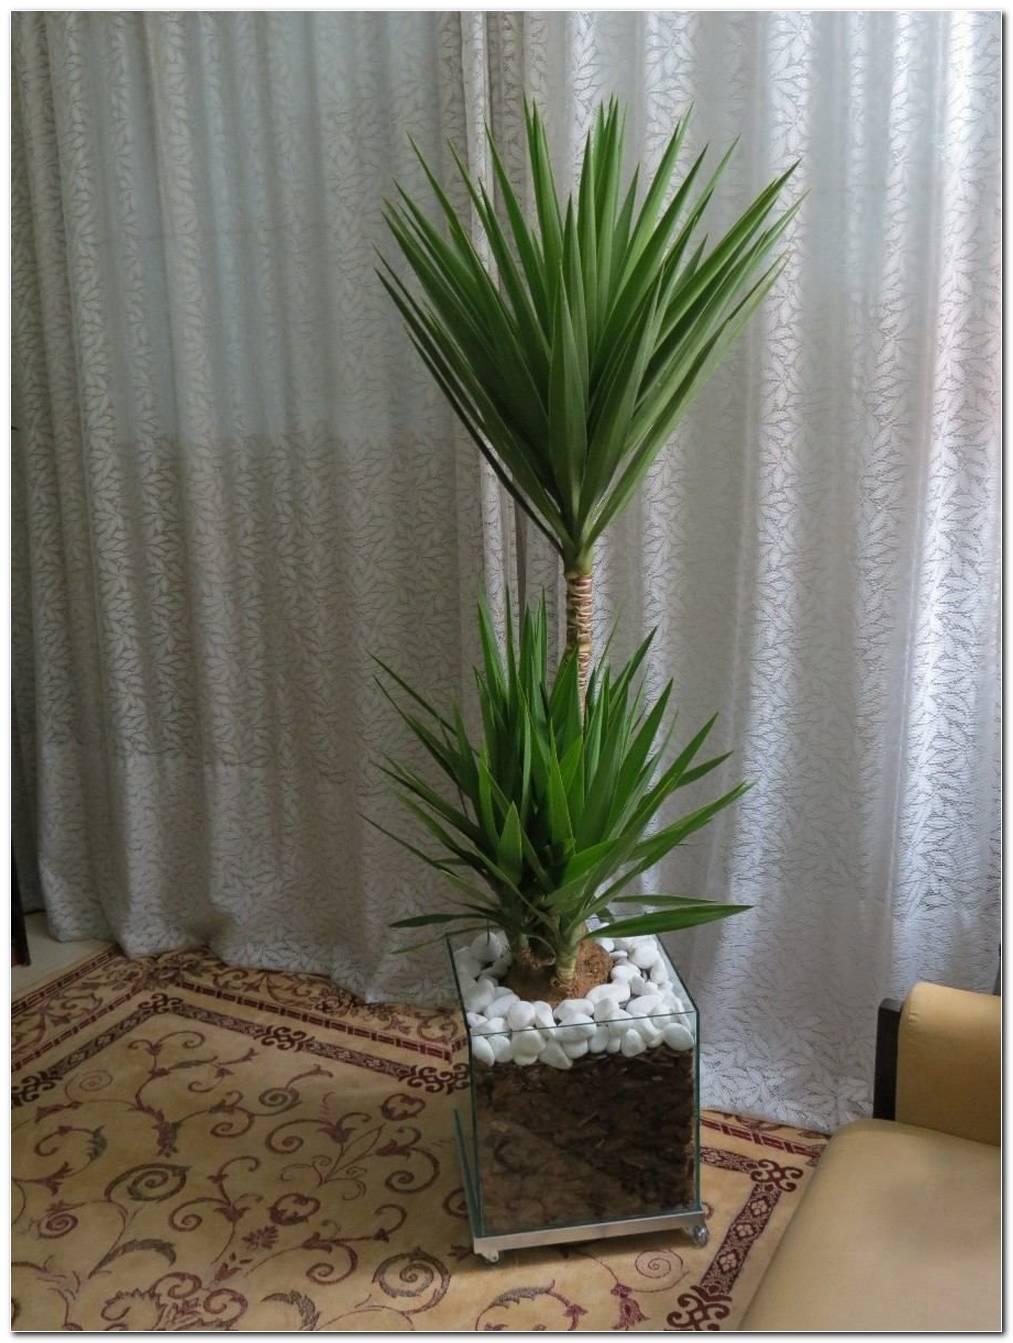 Plantas Artificiais Para Sala De Jantar